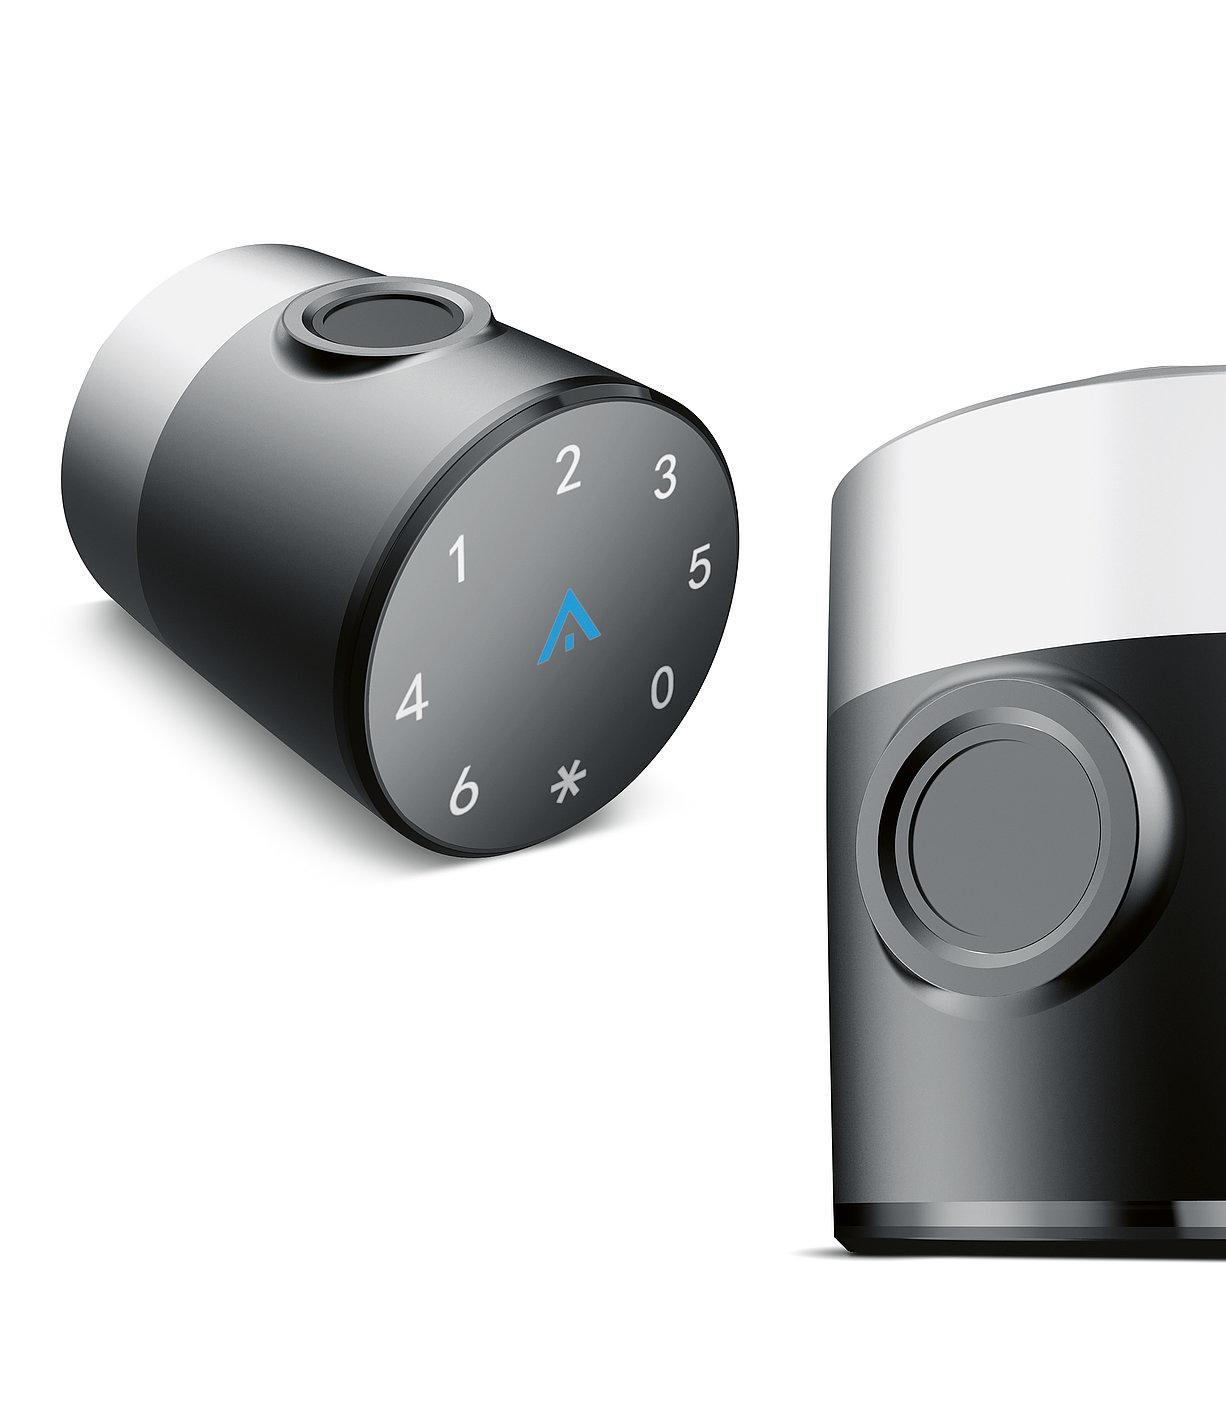 Multifunctional Smart Lock   Red Dot Design Award